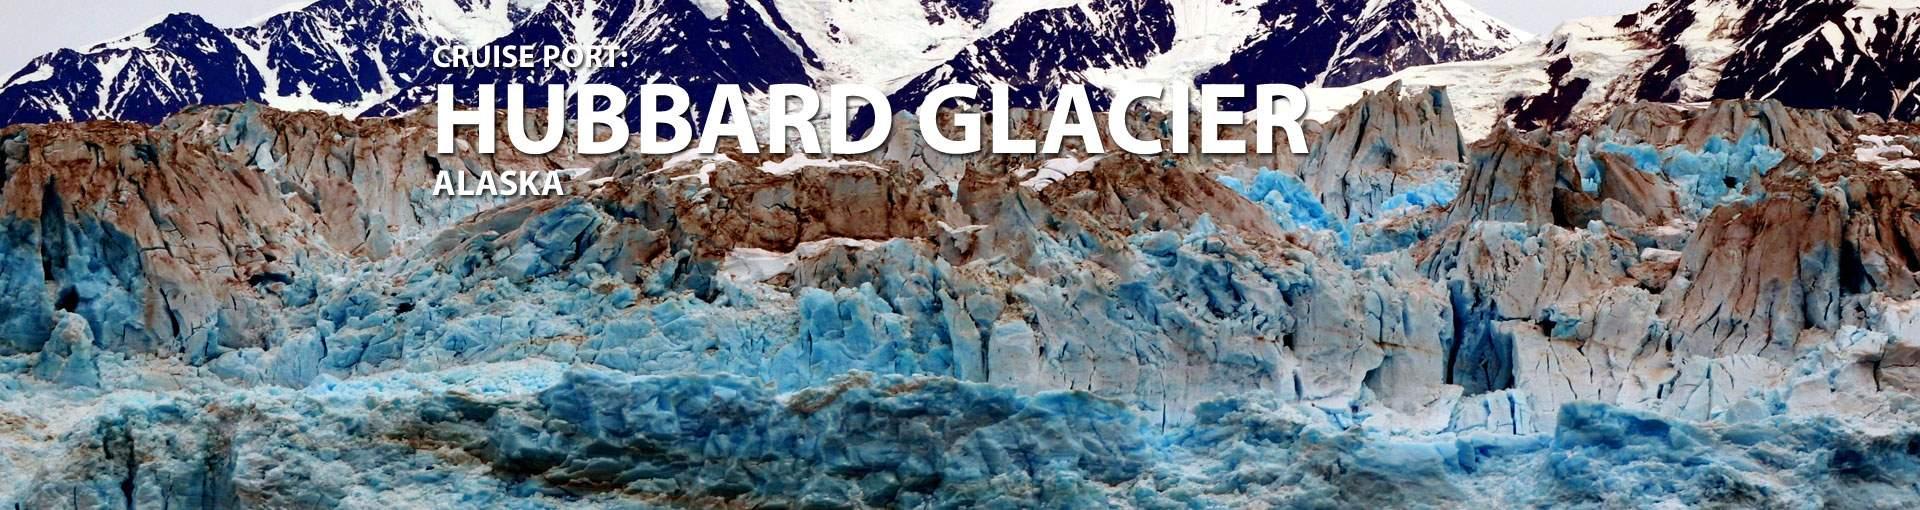 Cruises to Hubbard Glacier, Alaska